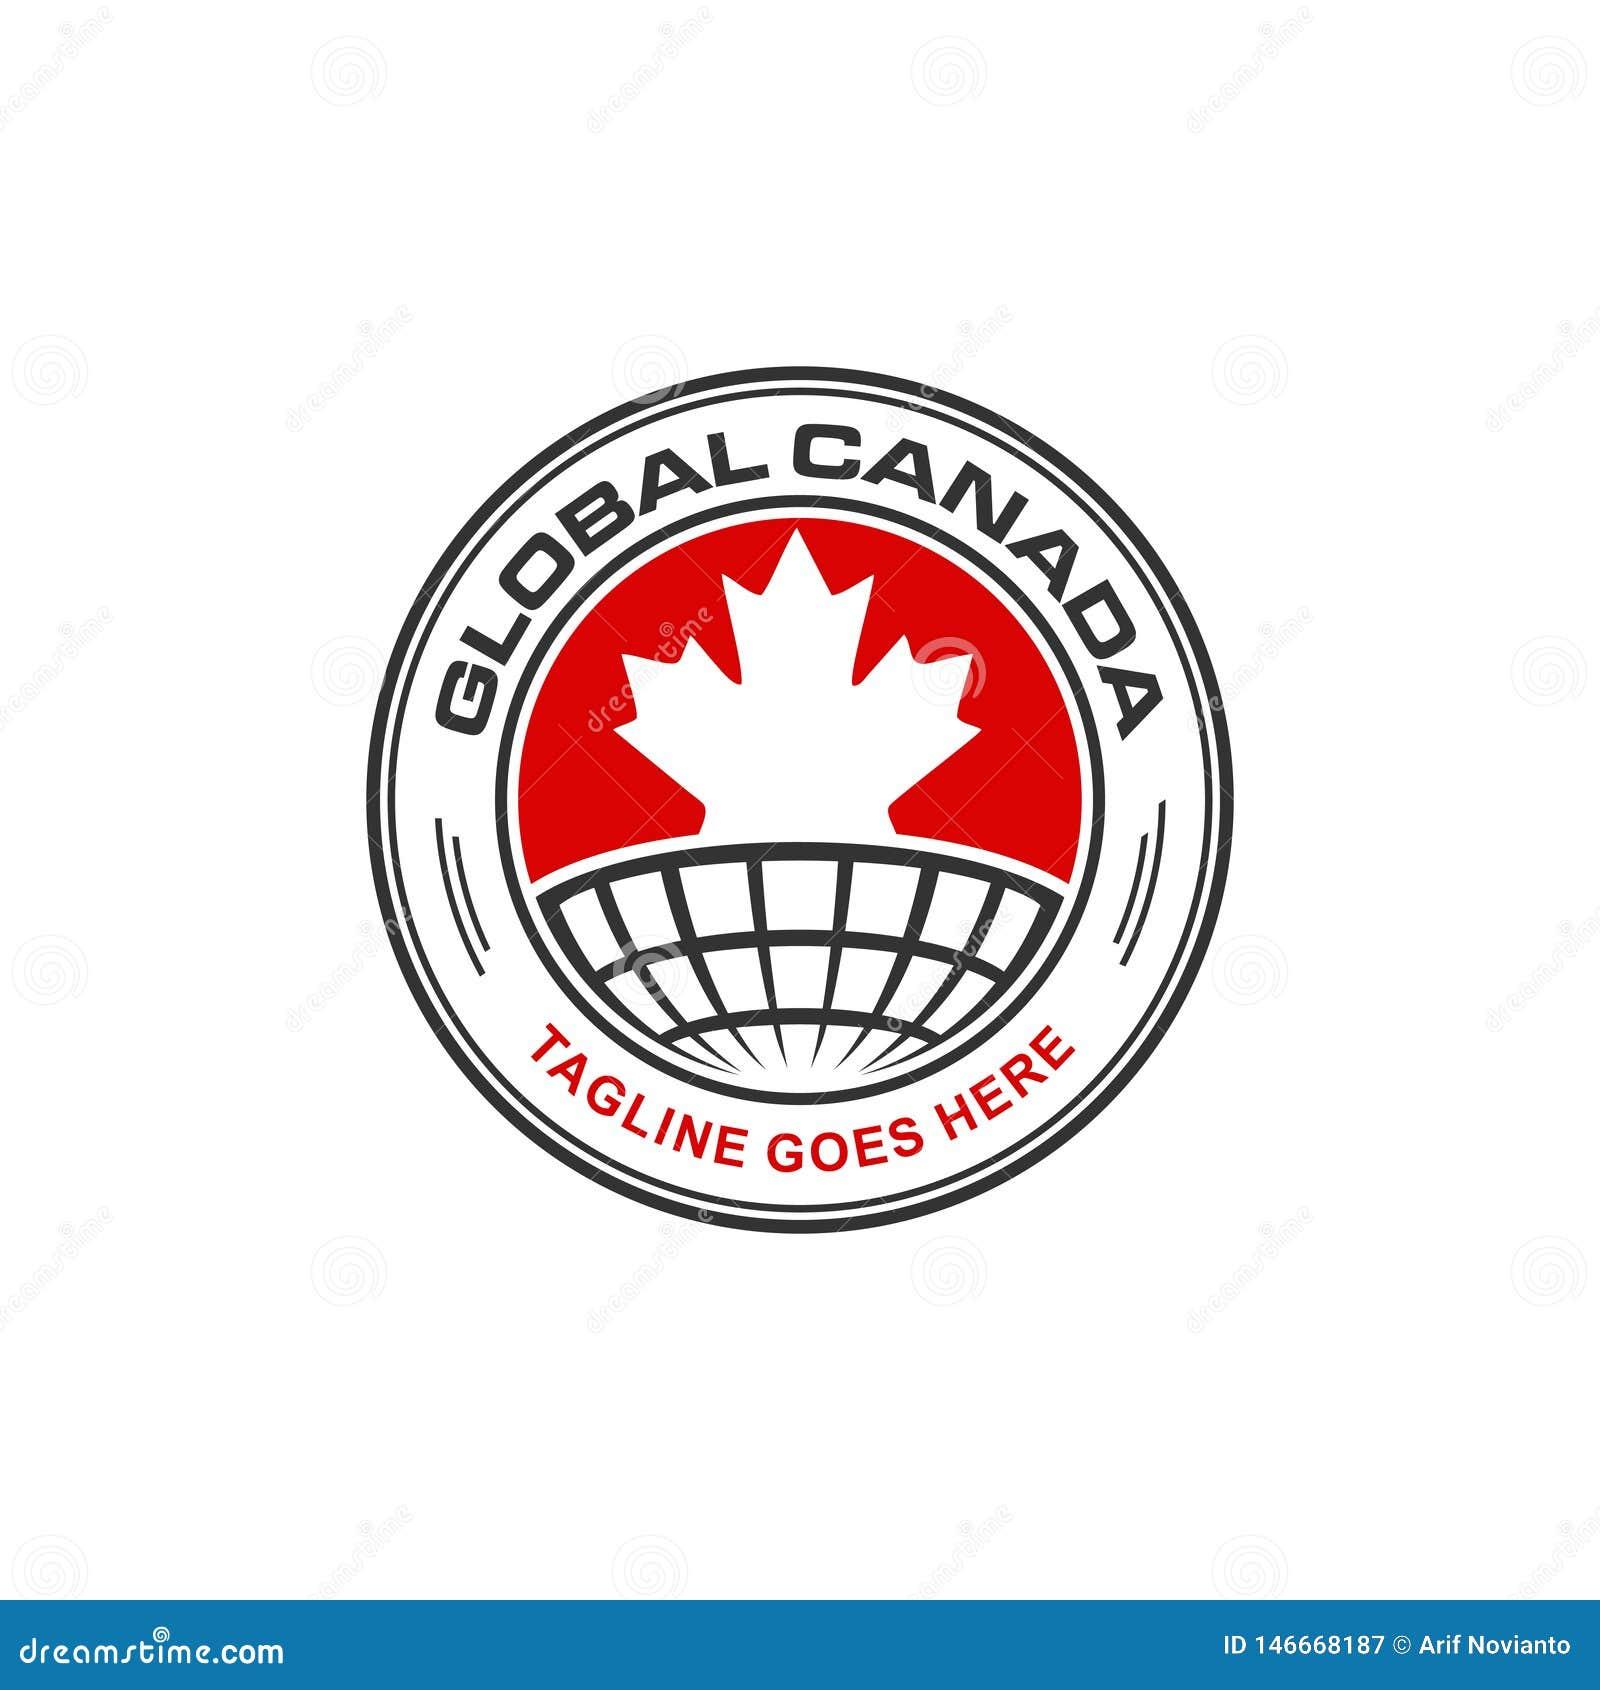 Global canada logo emblem